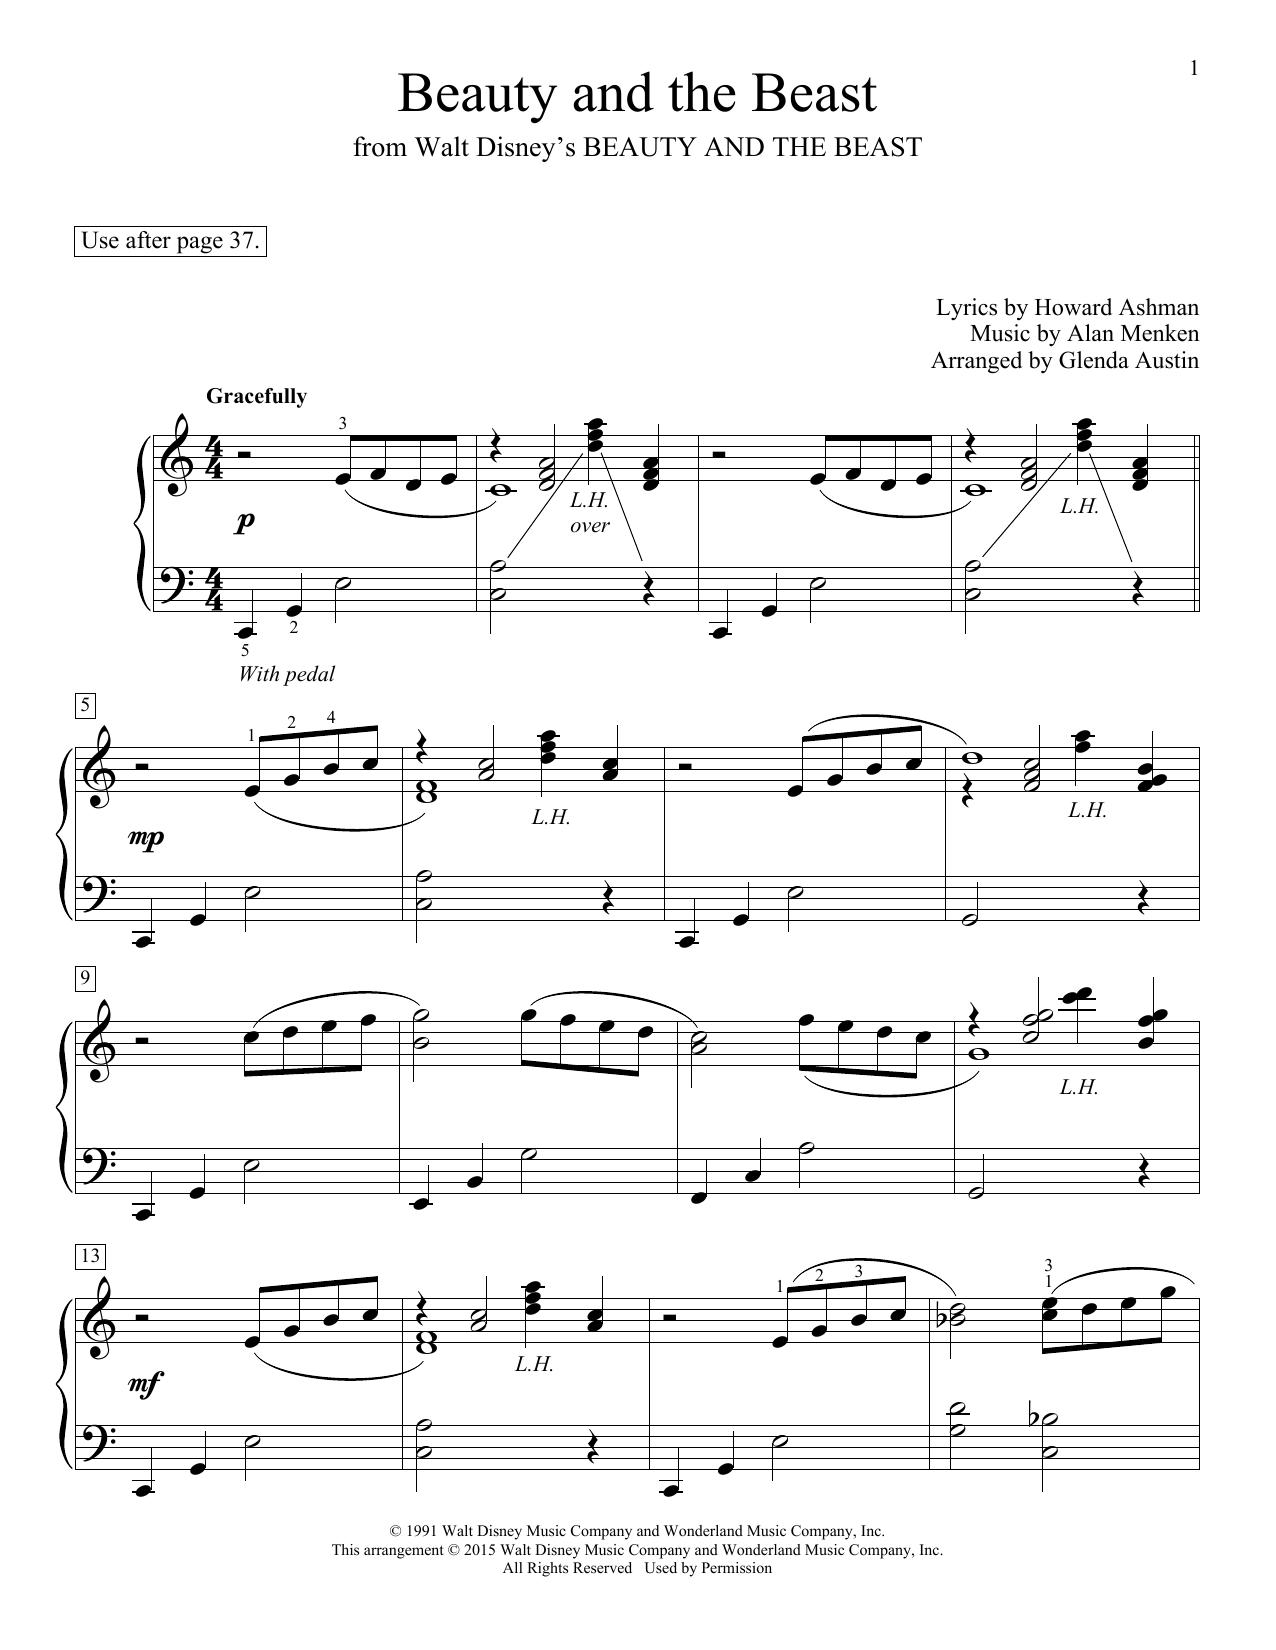 Beauty and the beast sheet music pdf free